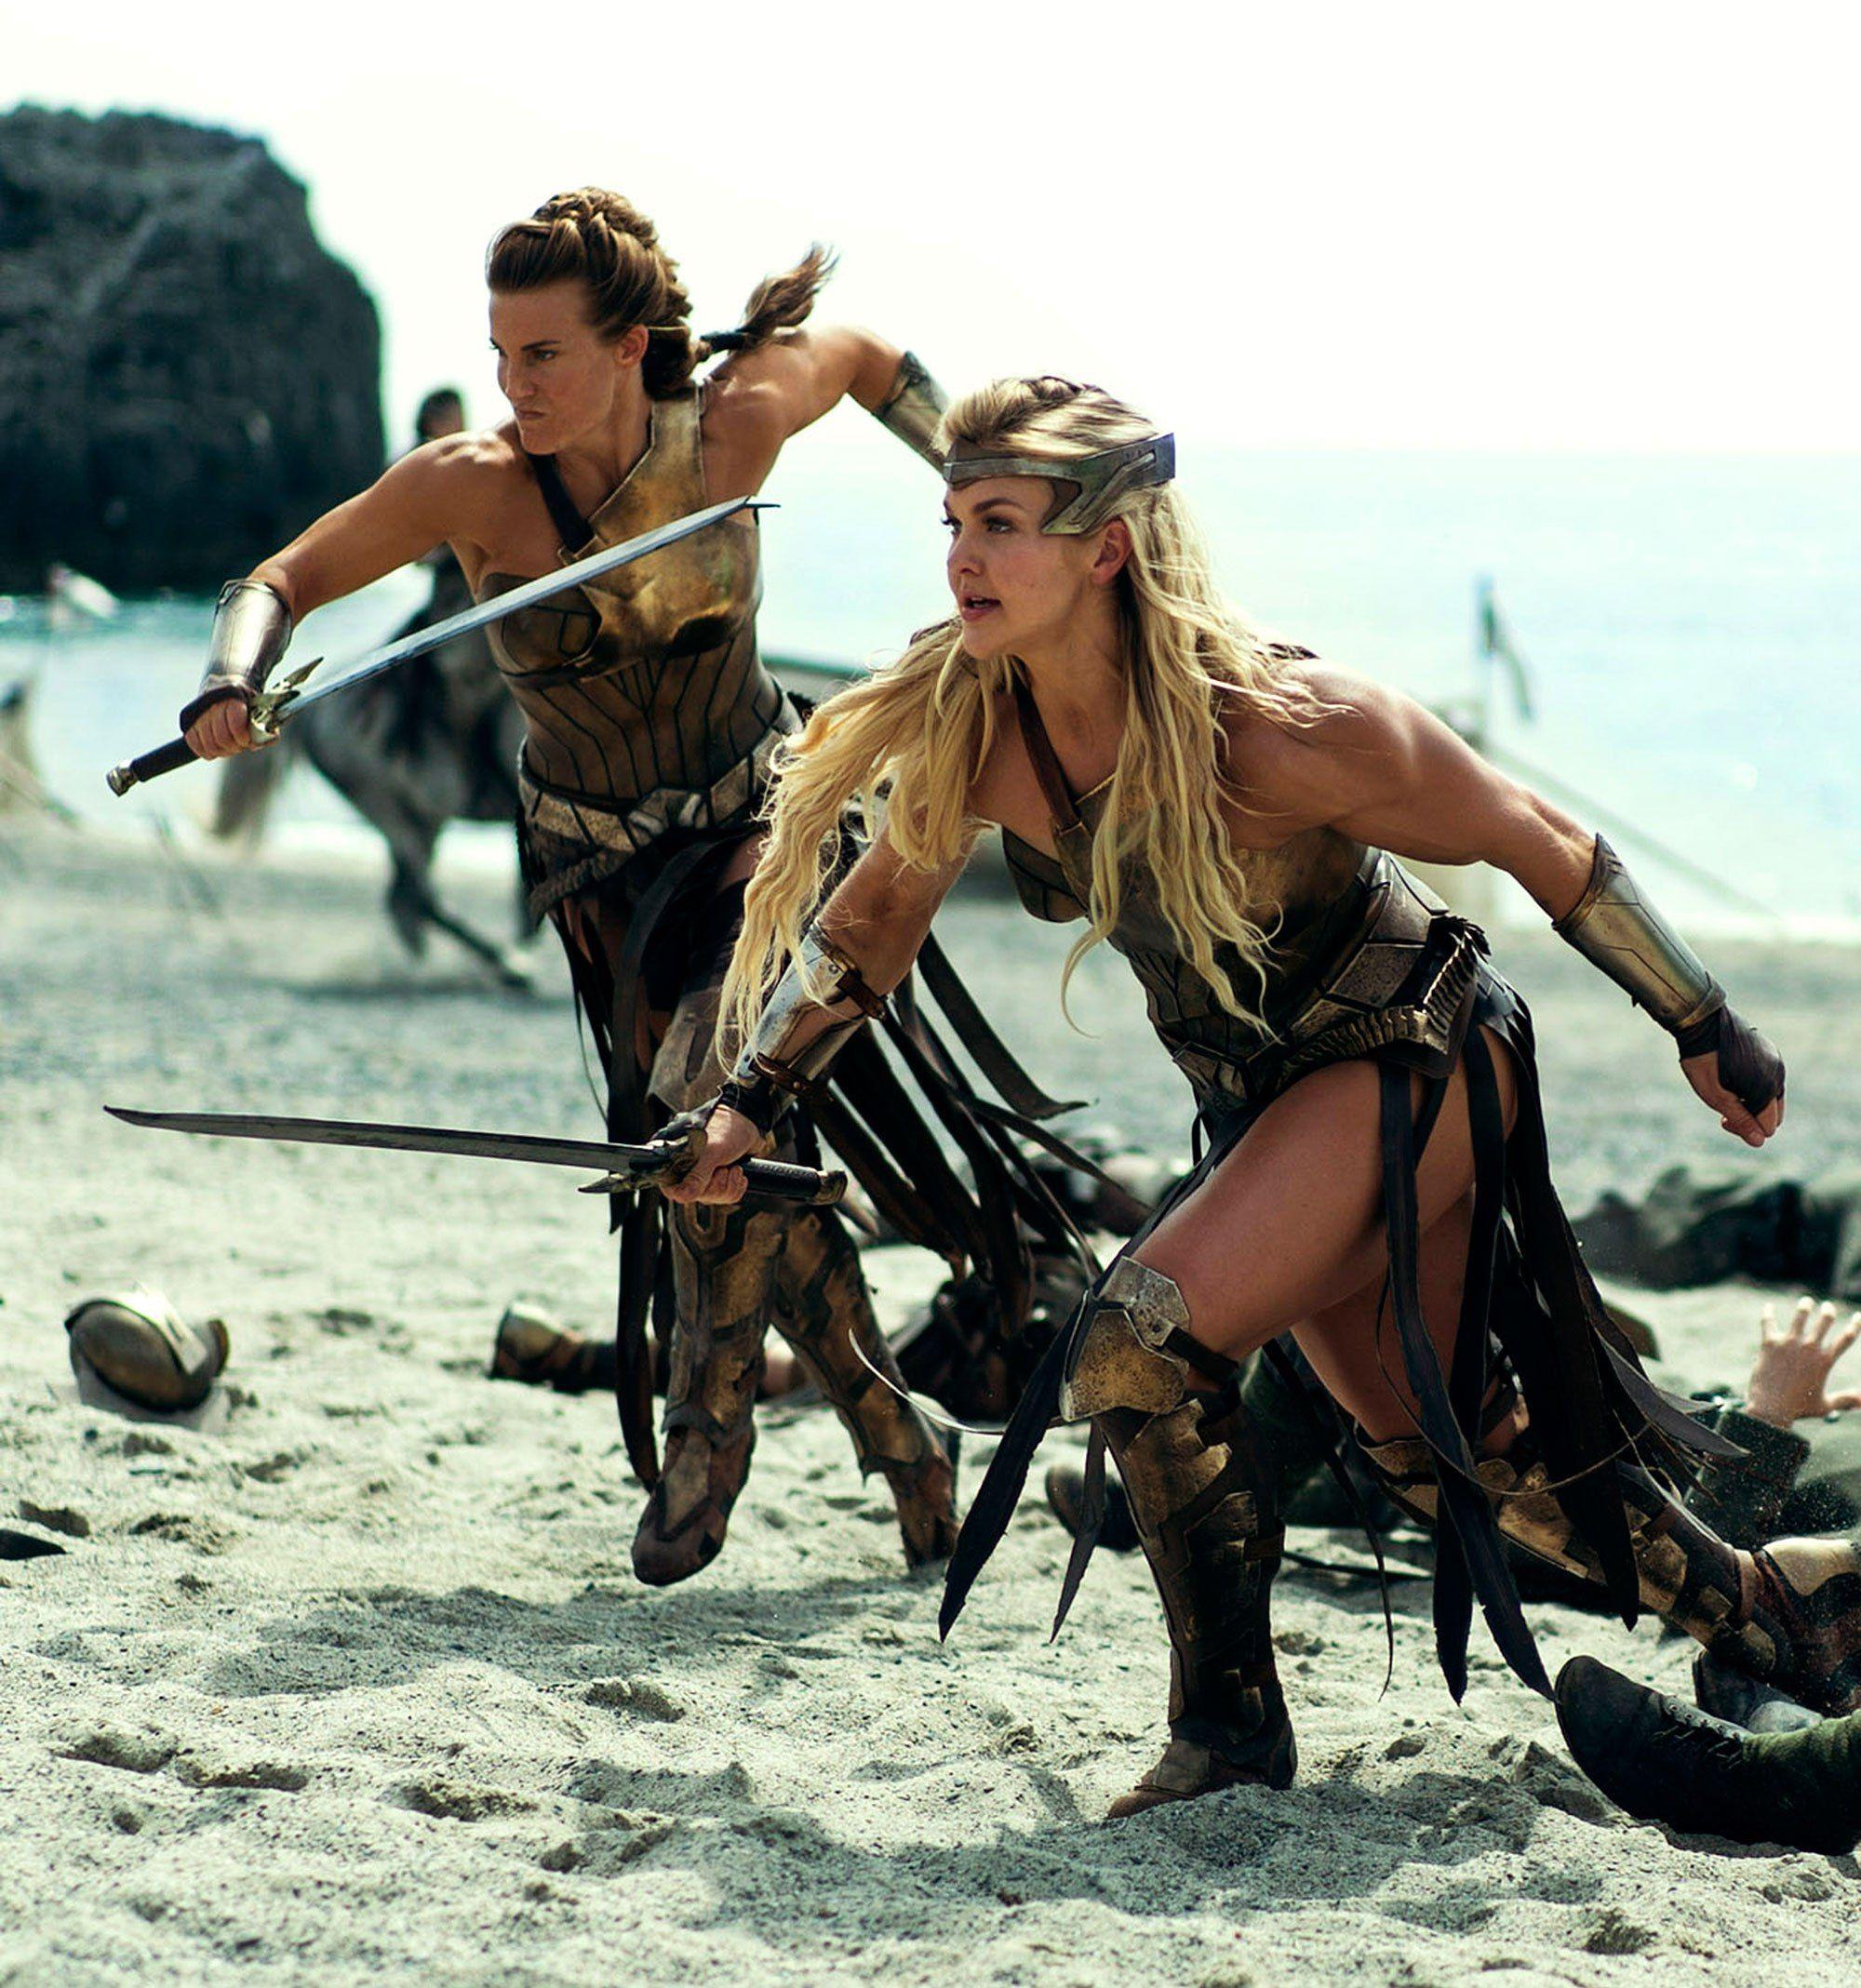 Amazon Warriors Fotos wonder woman amazon warrior and #crossfit athlete brooke